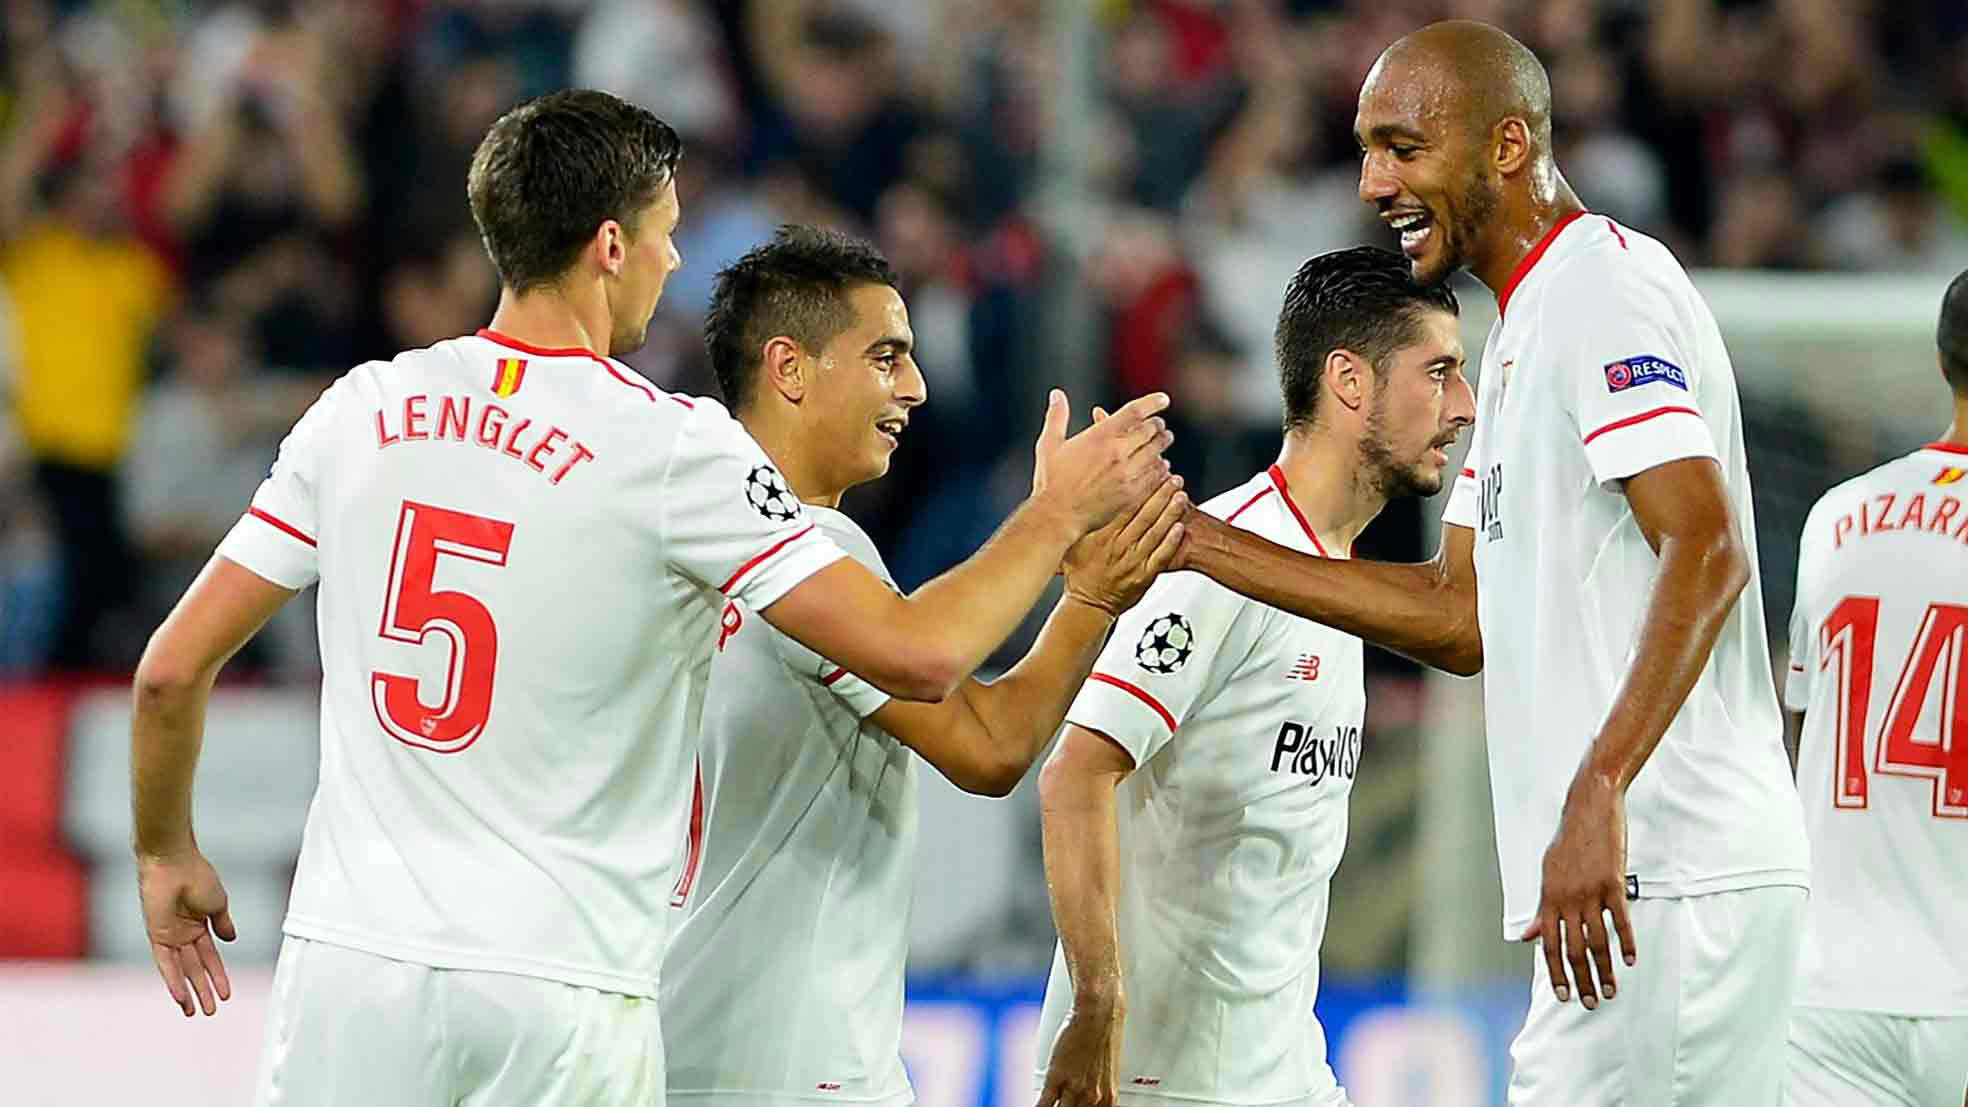 LACHAMPIONS | Sevilla - Spartak Moscú (2-1)